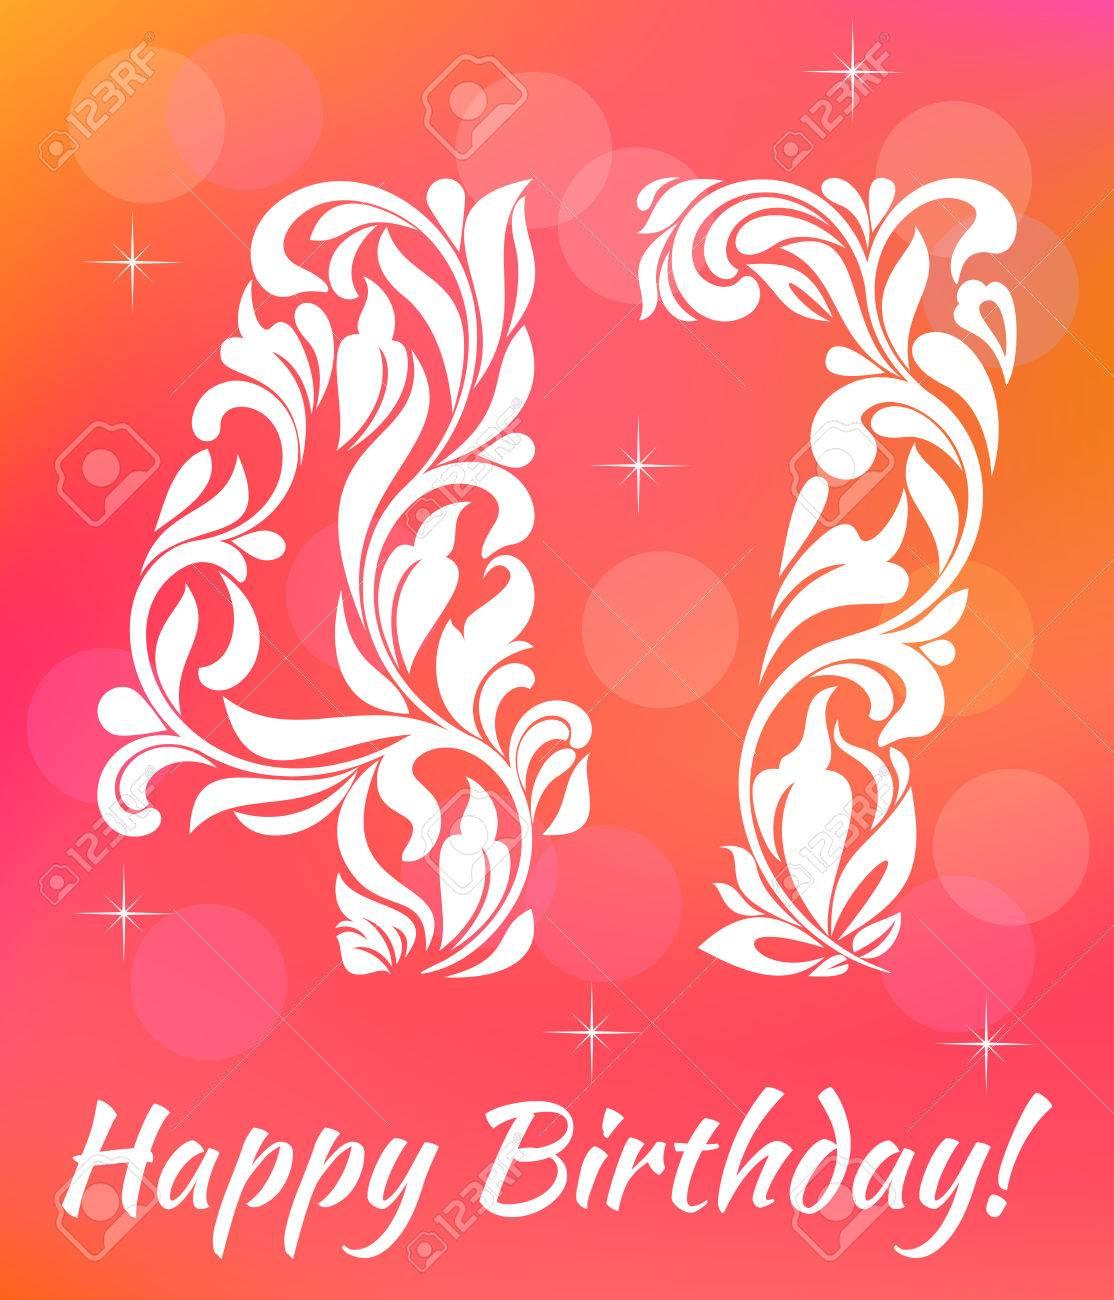 Bright Greeting Card Template Celebrating 47 Years Birthday